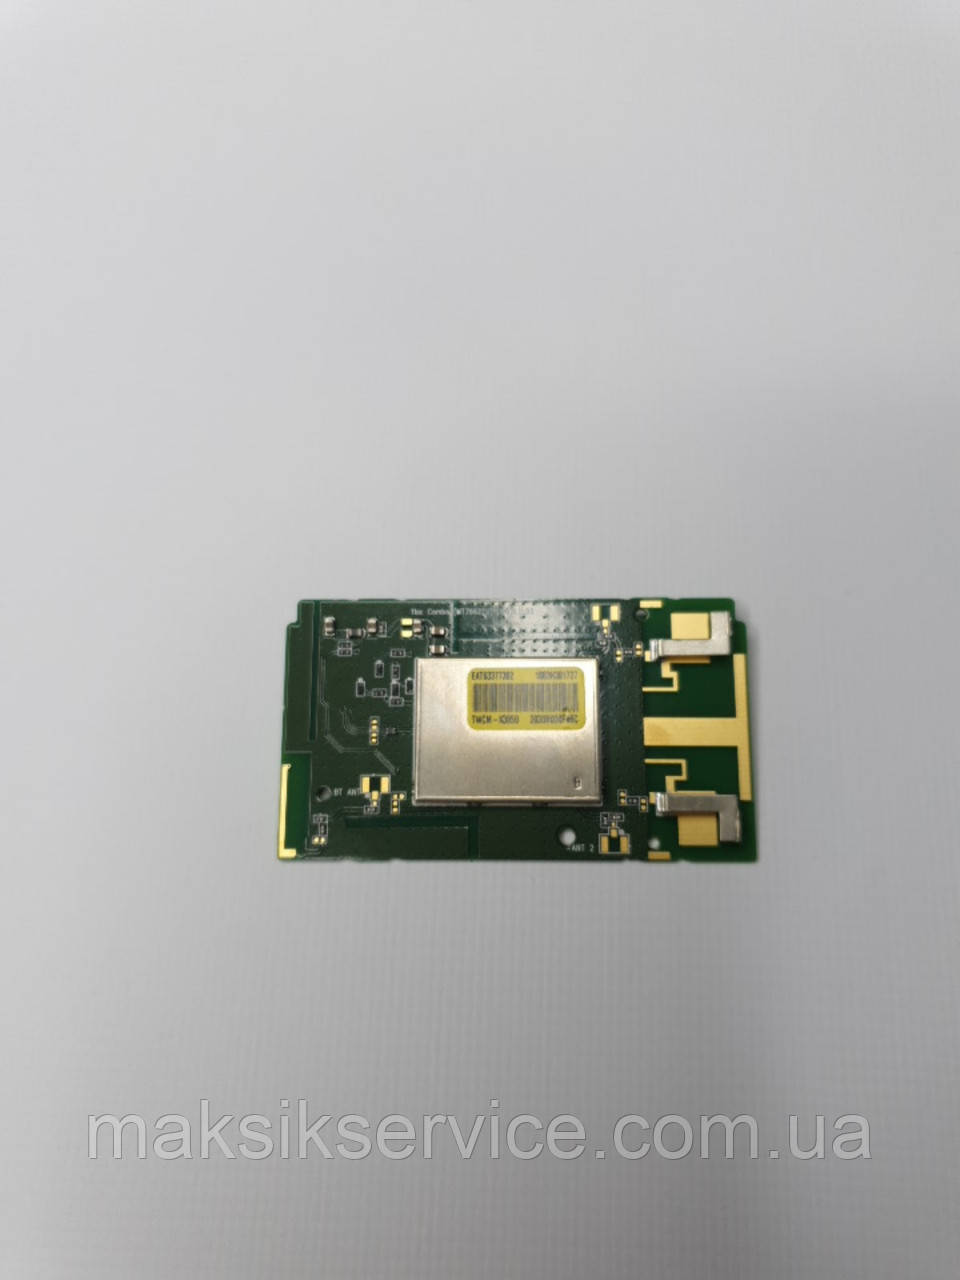 Модуль WI-Fi телевизора EAT63377302 LG Lgsbwac72